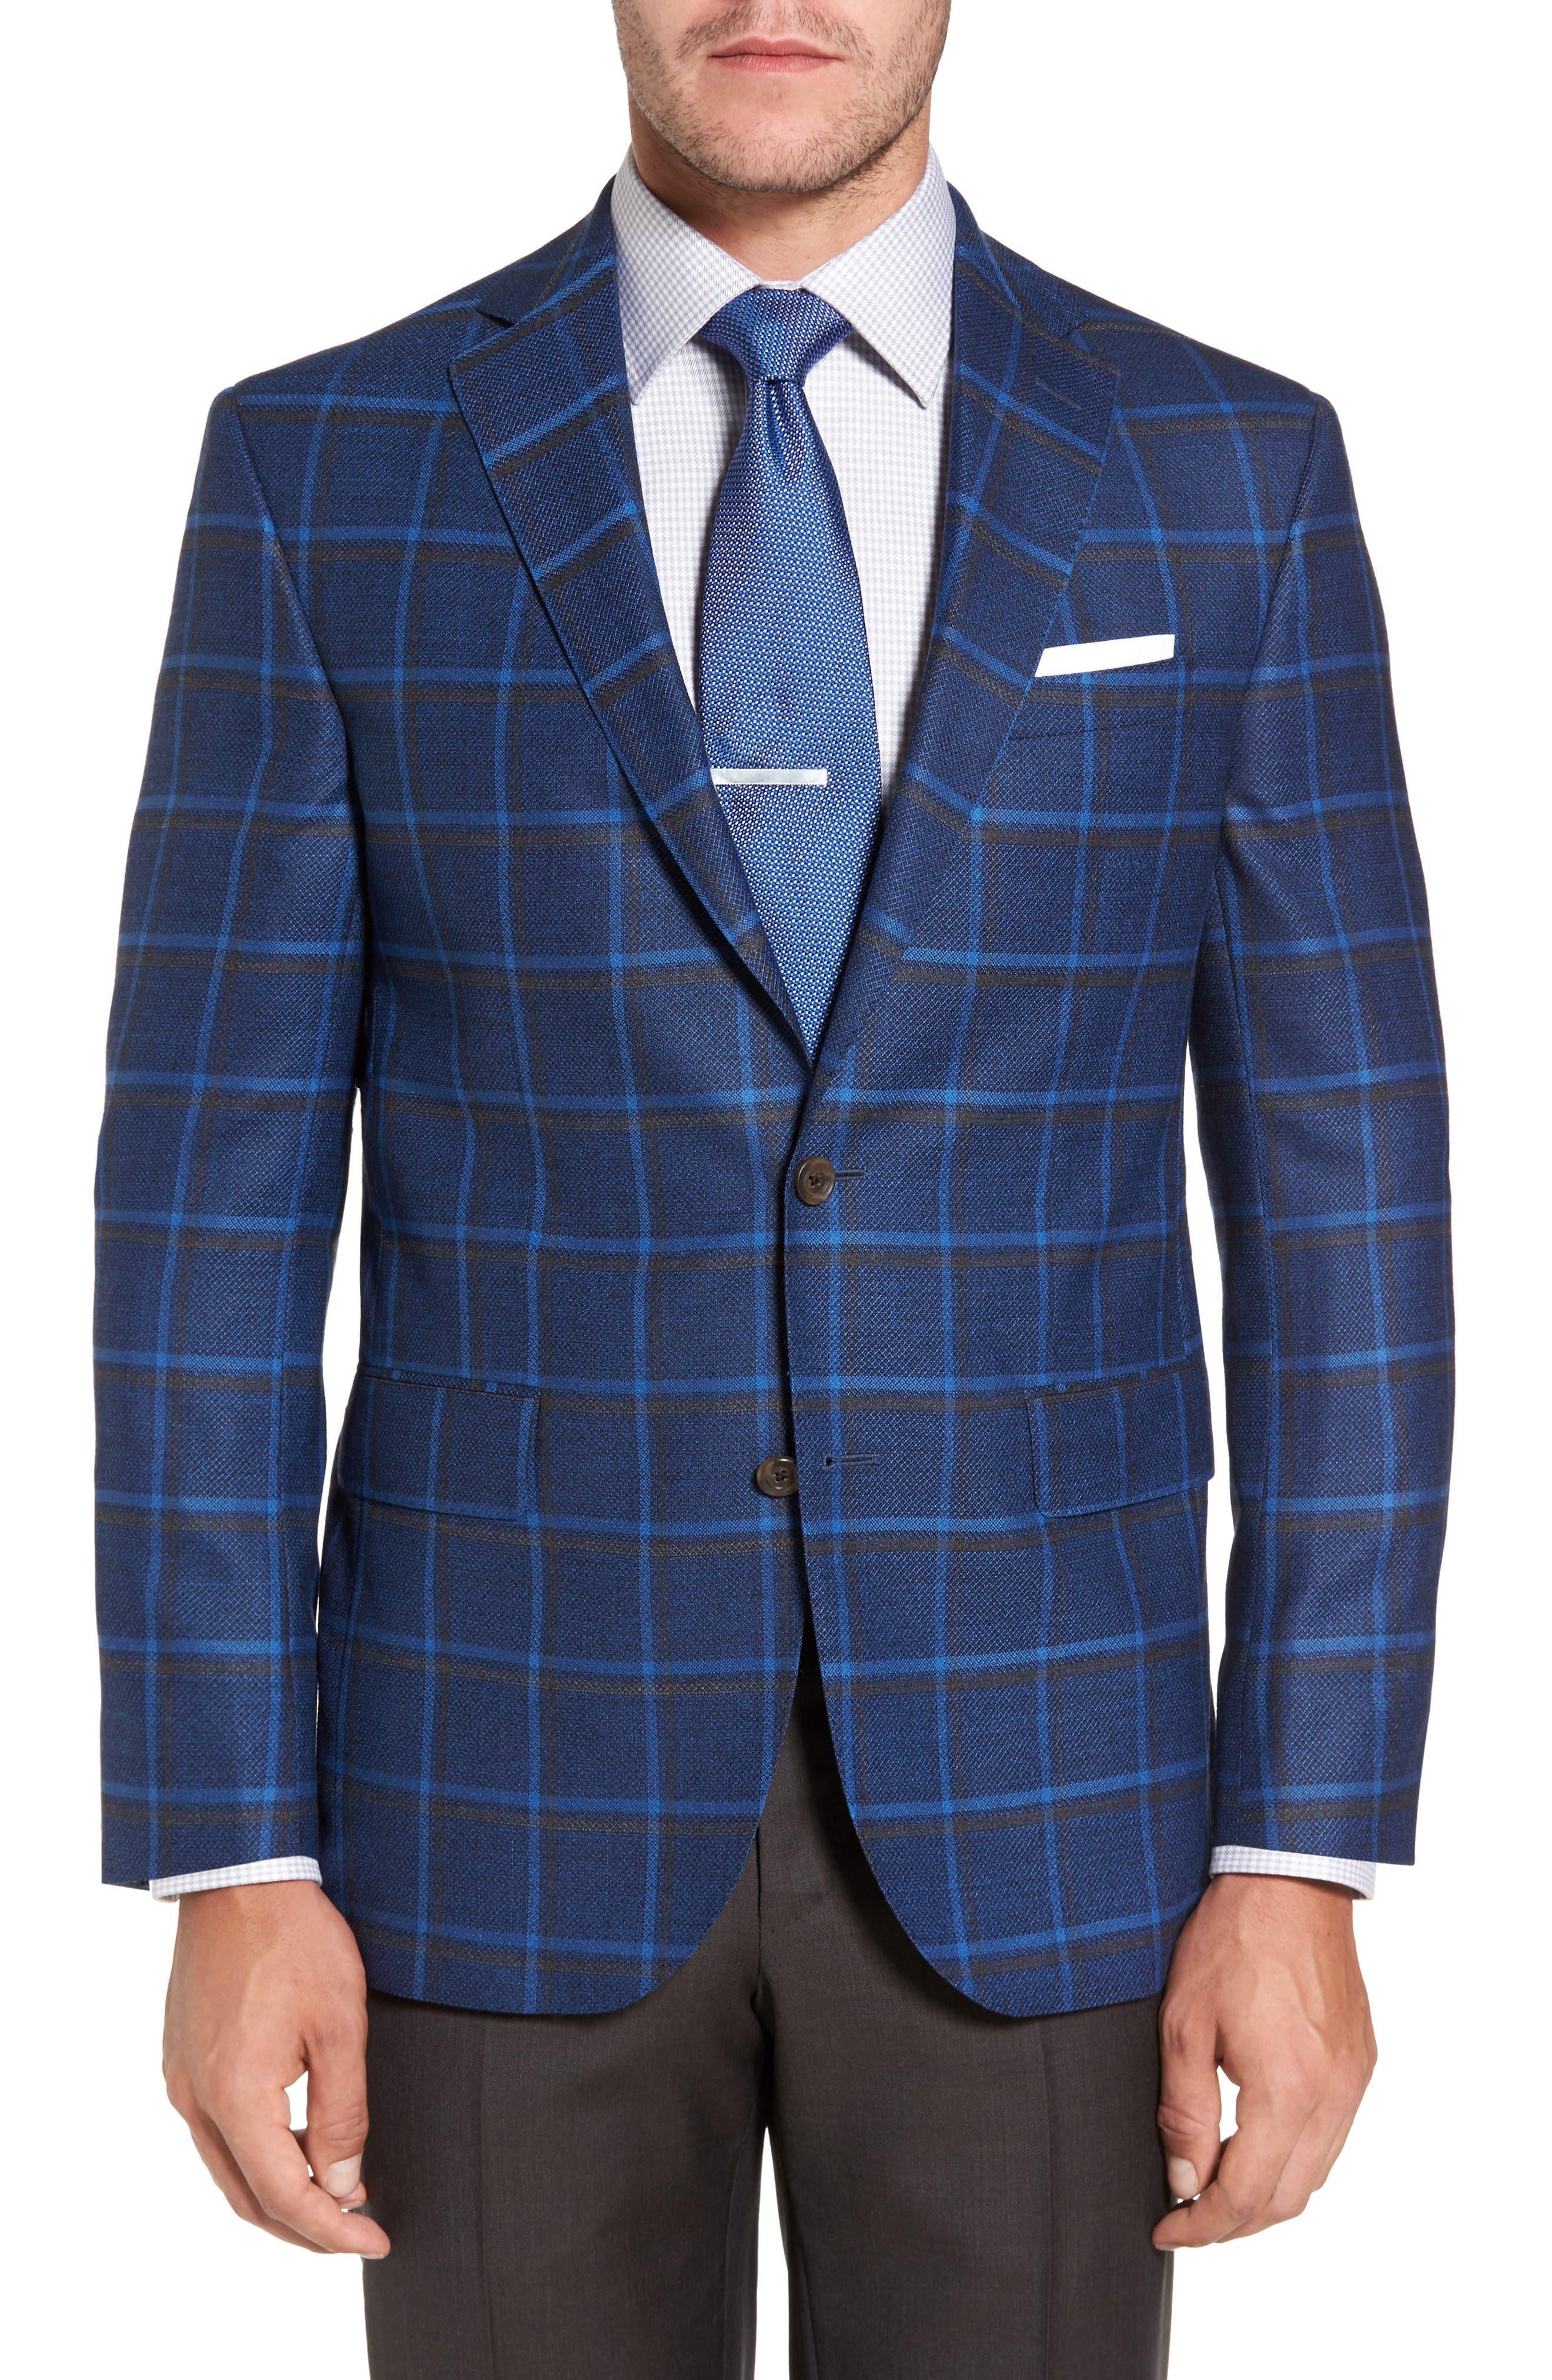 Alternate Image 1 Selected - David Donahue Connor Classic Fit Plaid Sport Coat